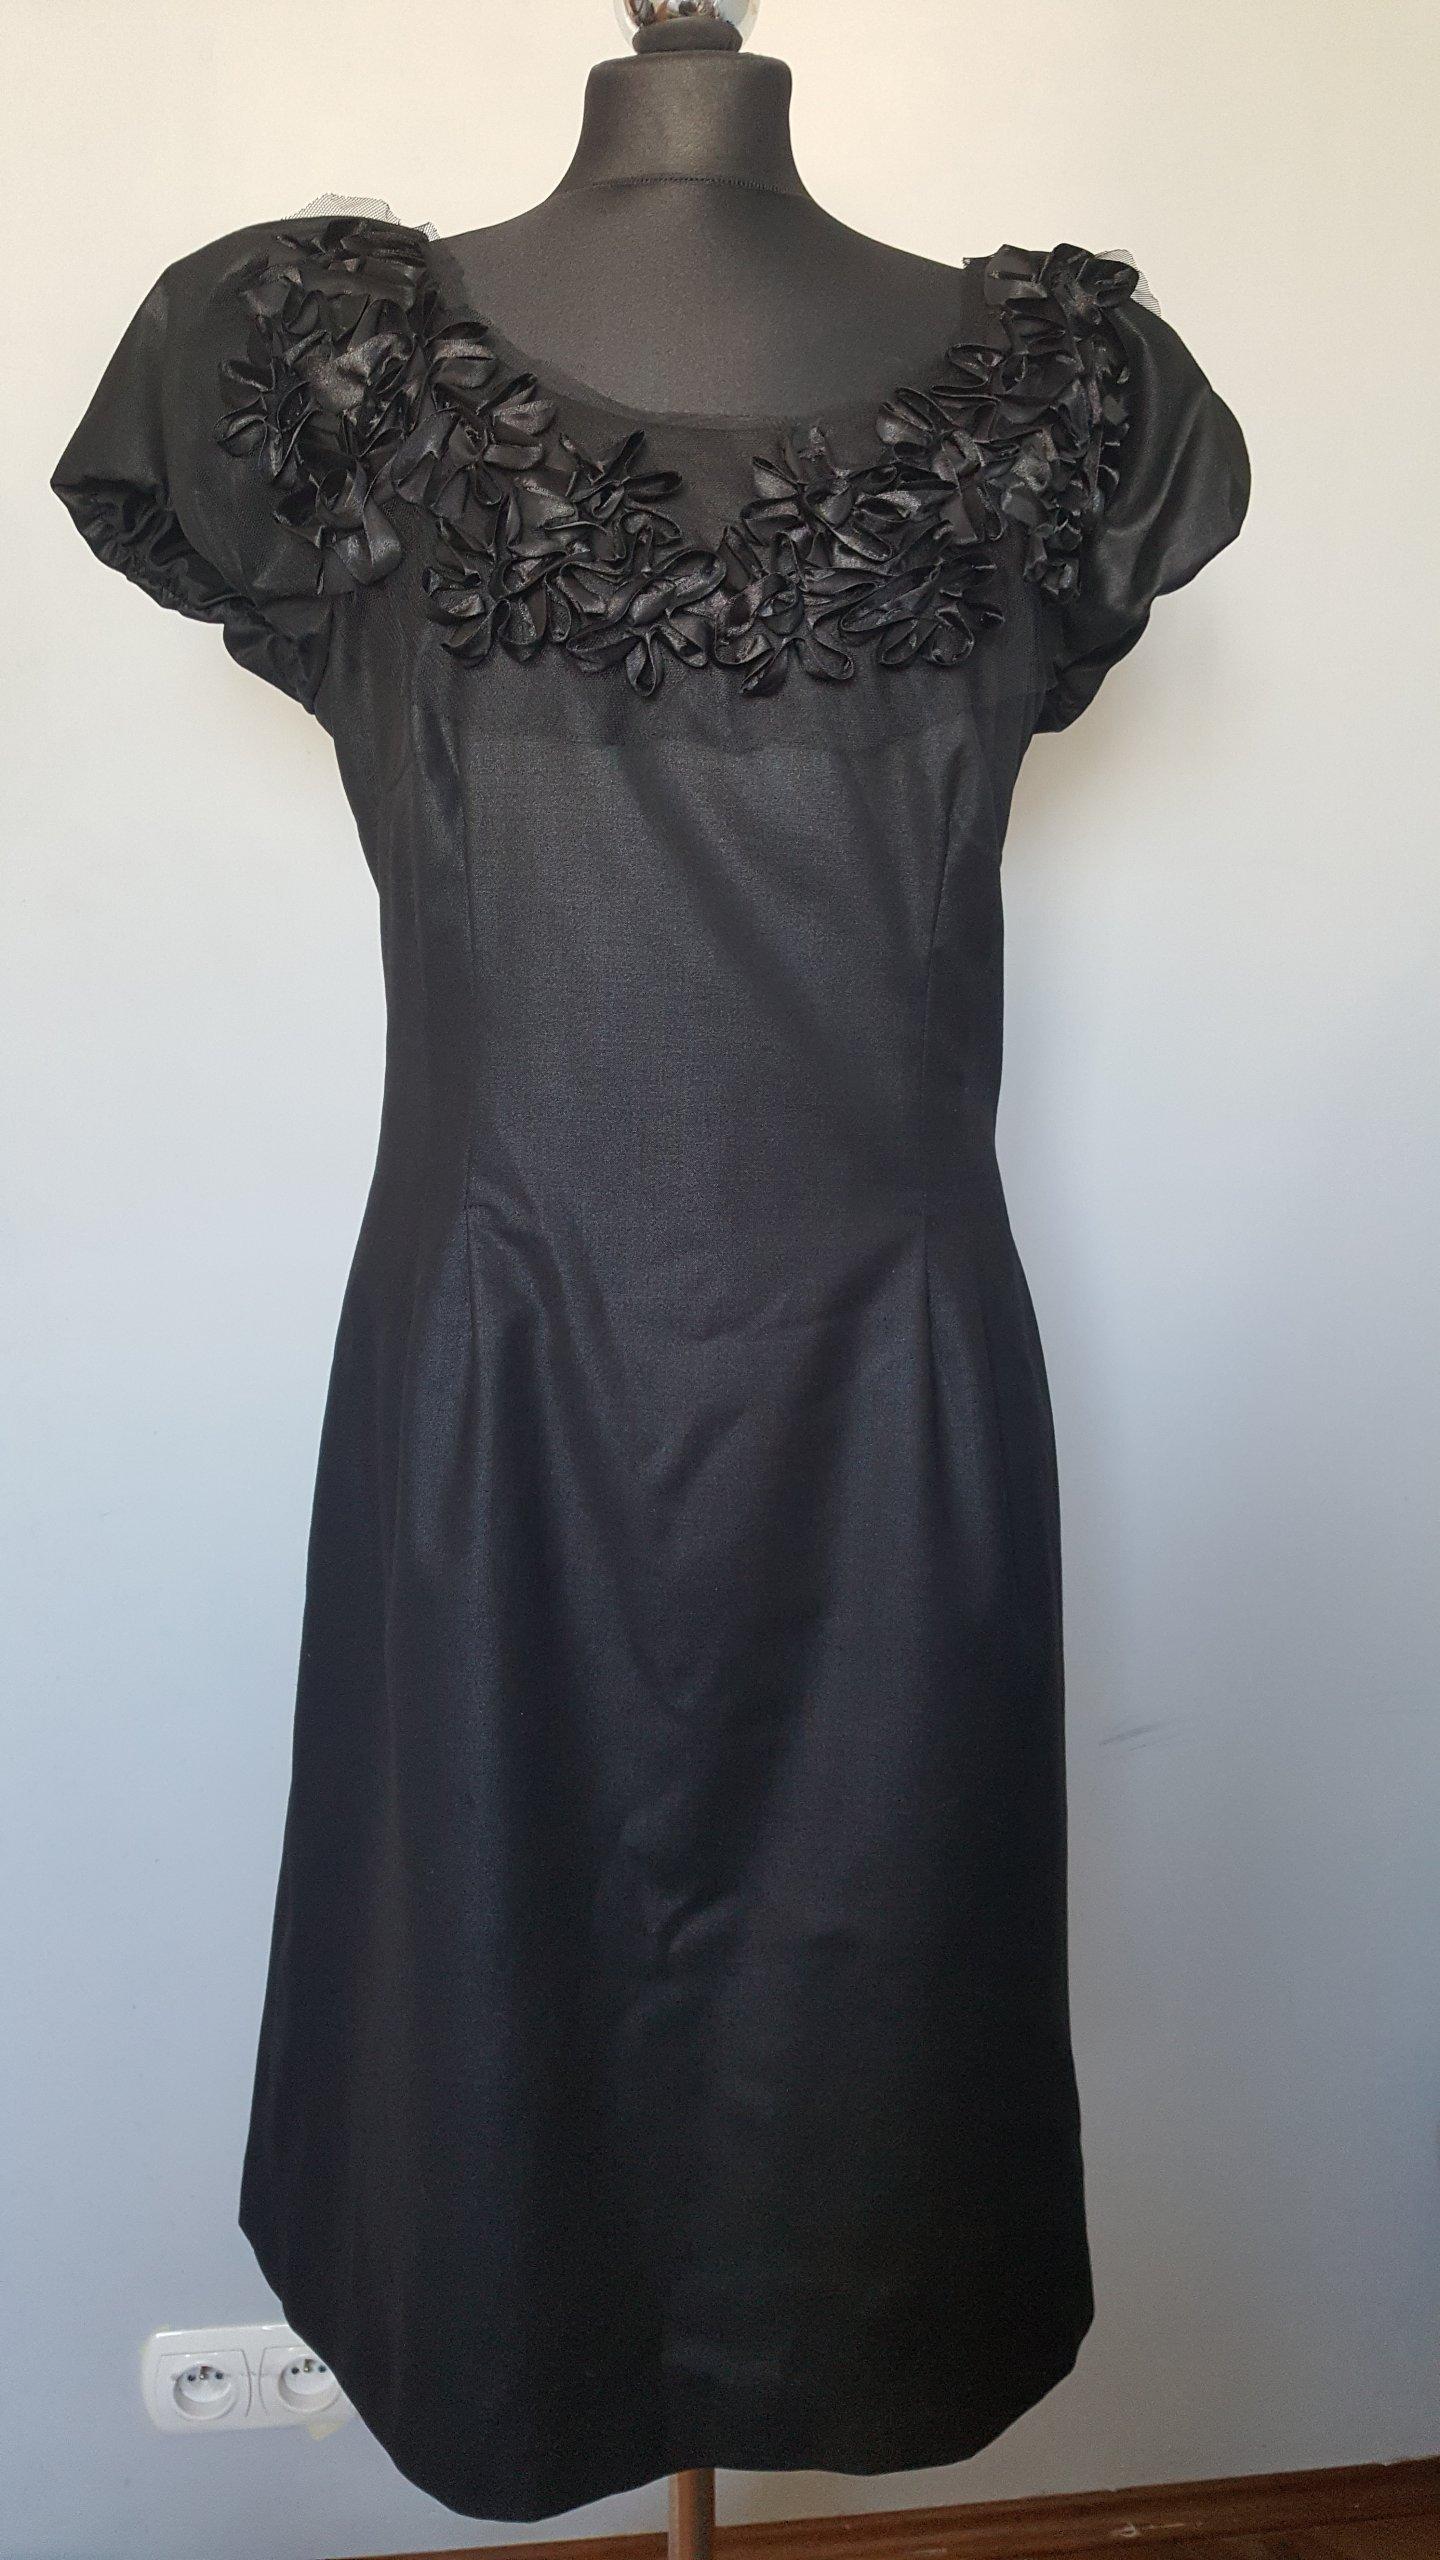 8c6a31c62c SIMLPLE czarna koktajlowa sukienka r.44 - 7242634464 - oficjalne ...